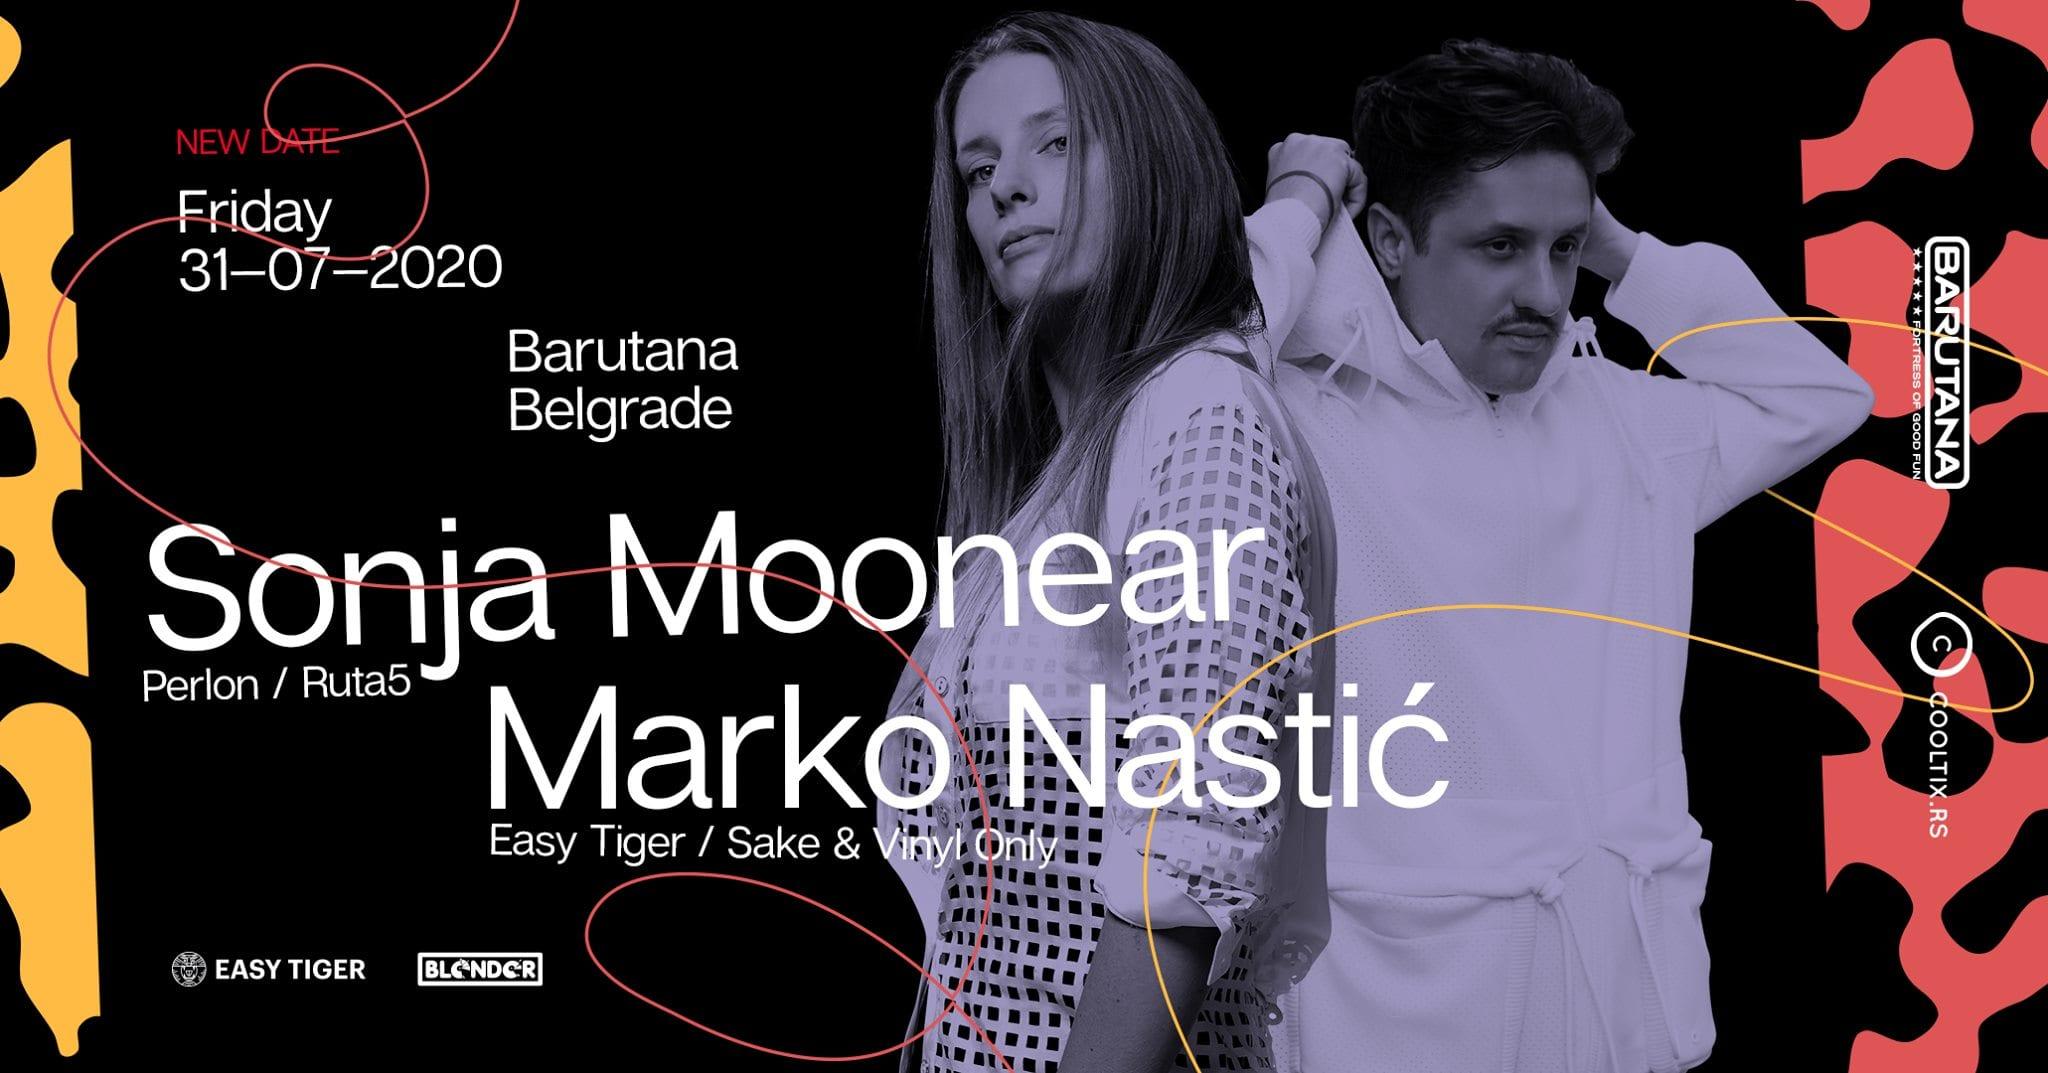 Barutana & Blender party